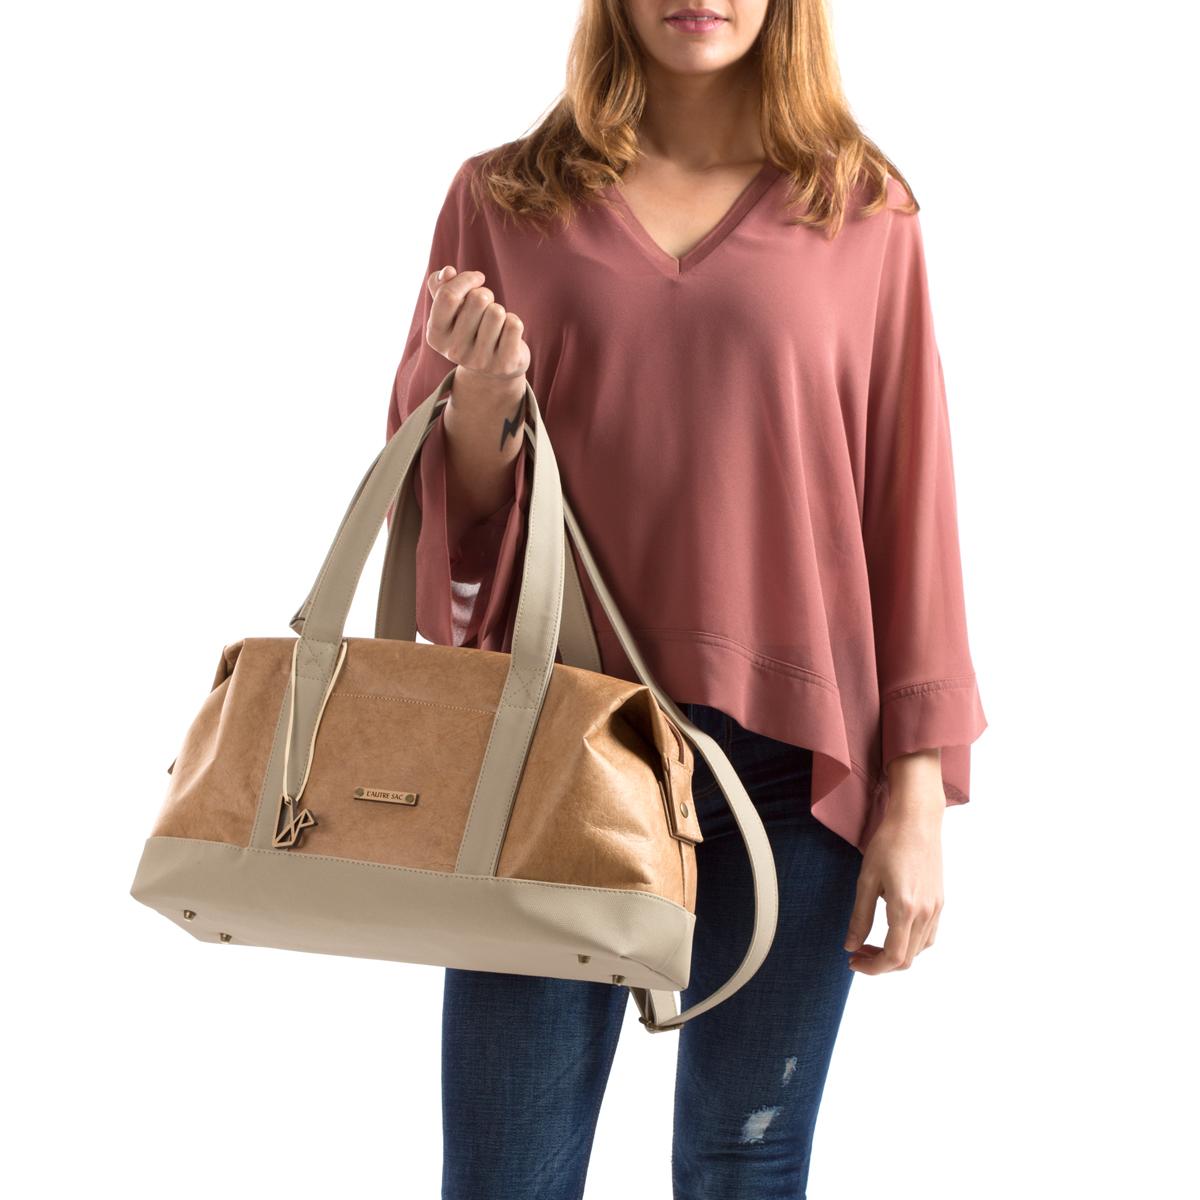 Fotografía ecommerce de moda para los bolsos L'Autresac